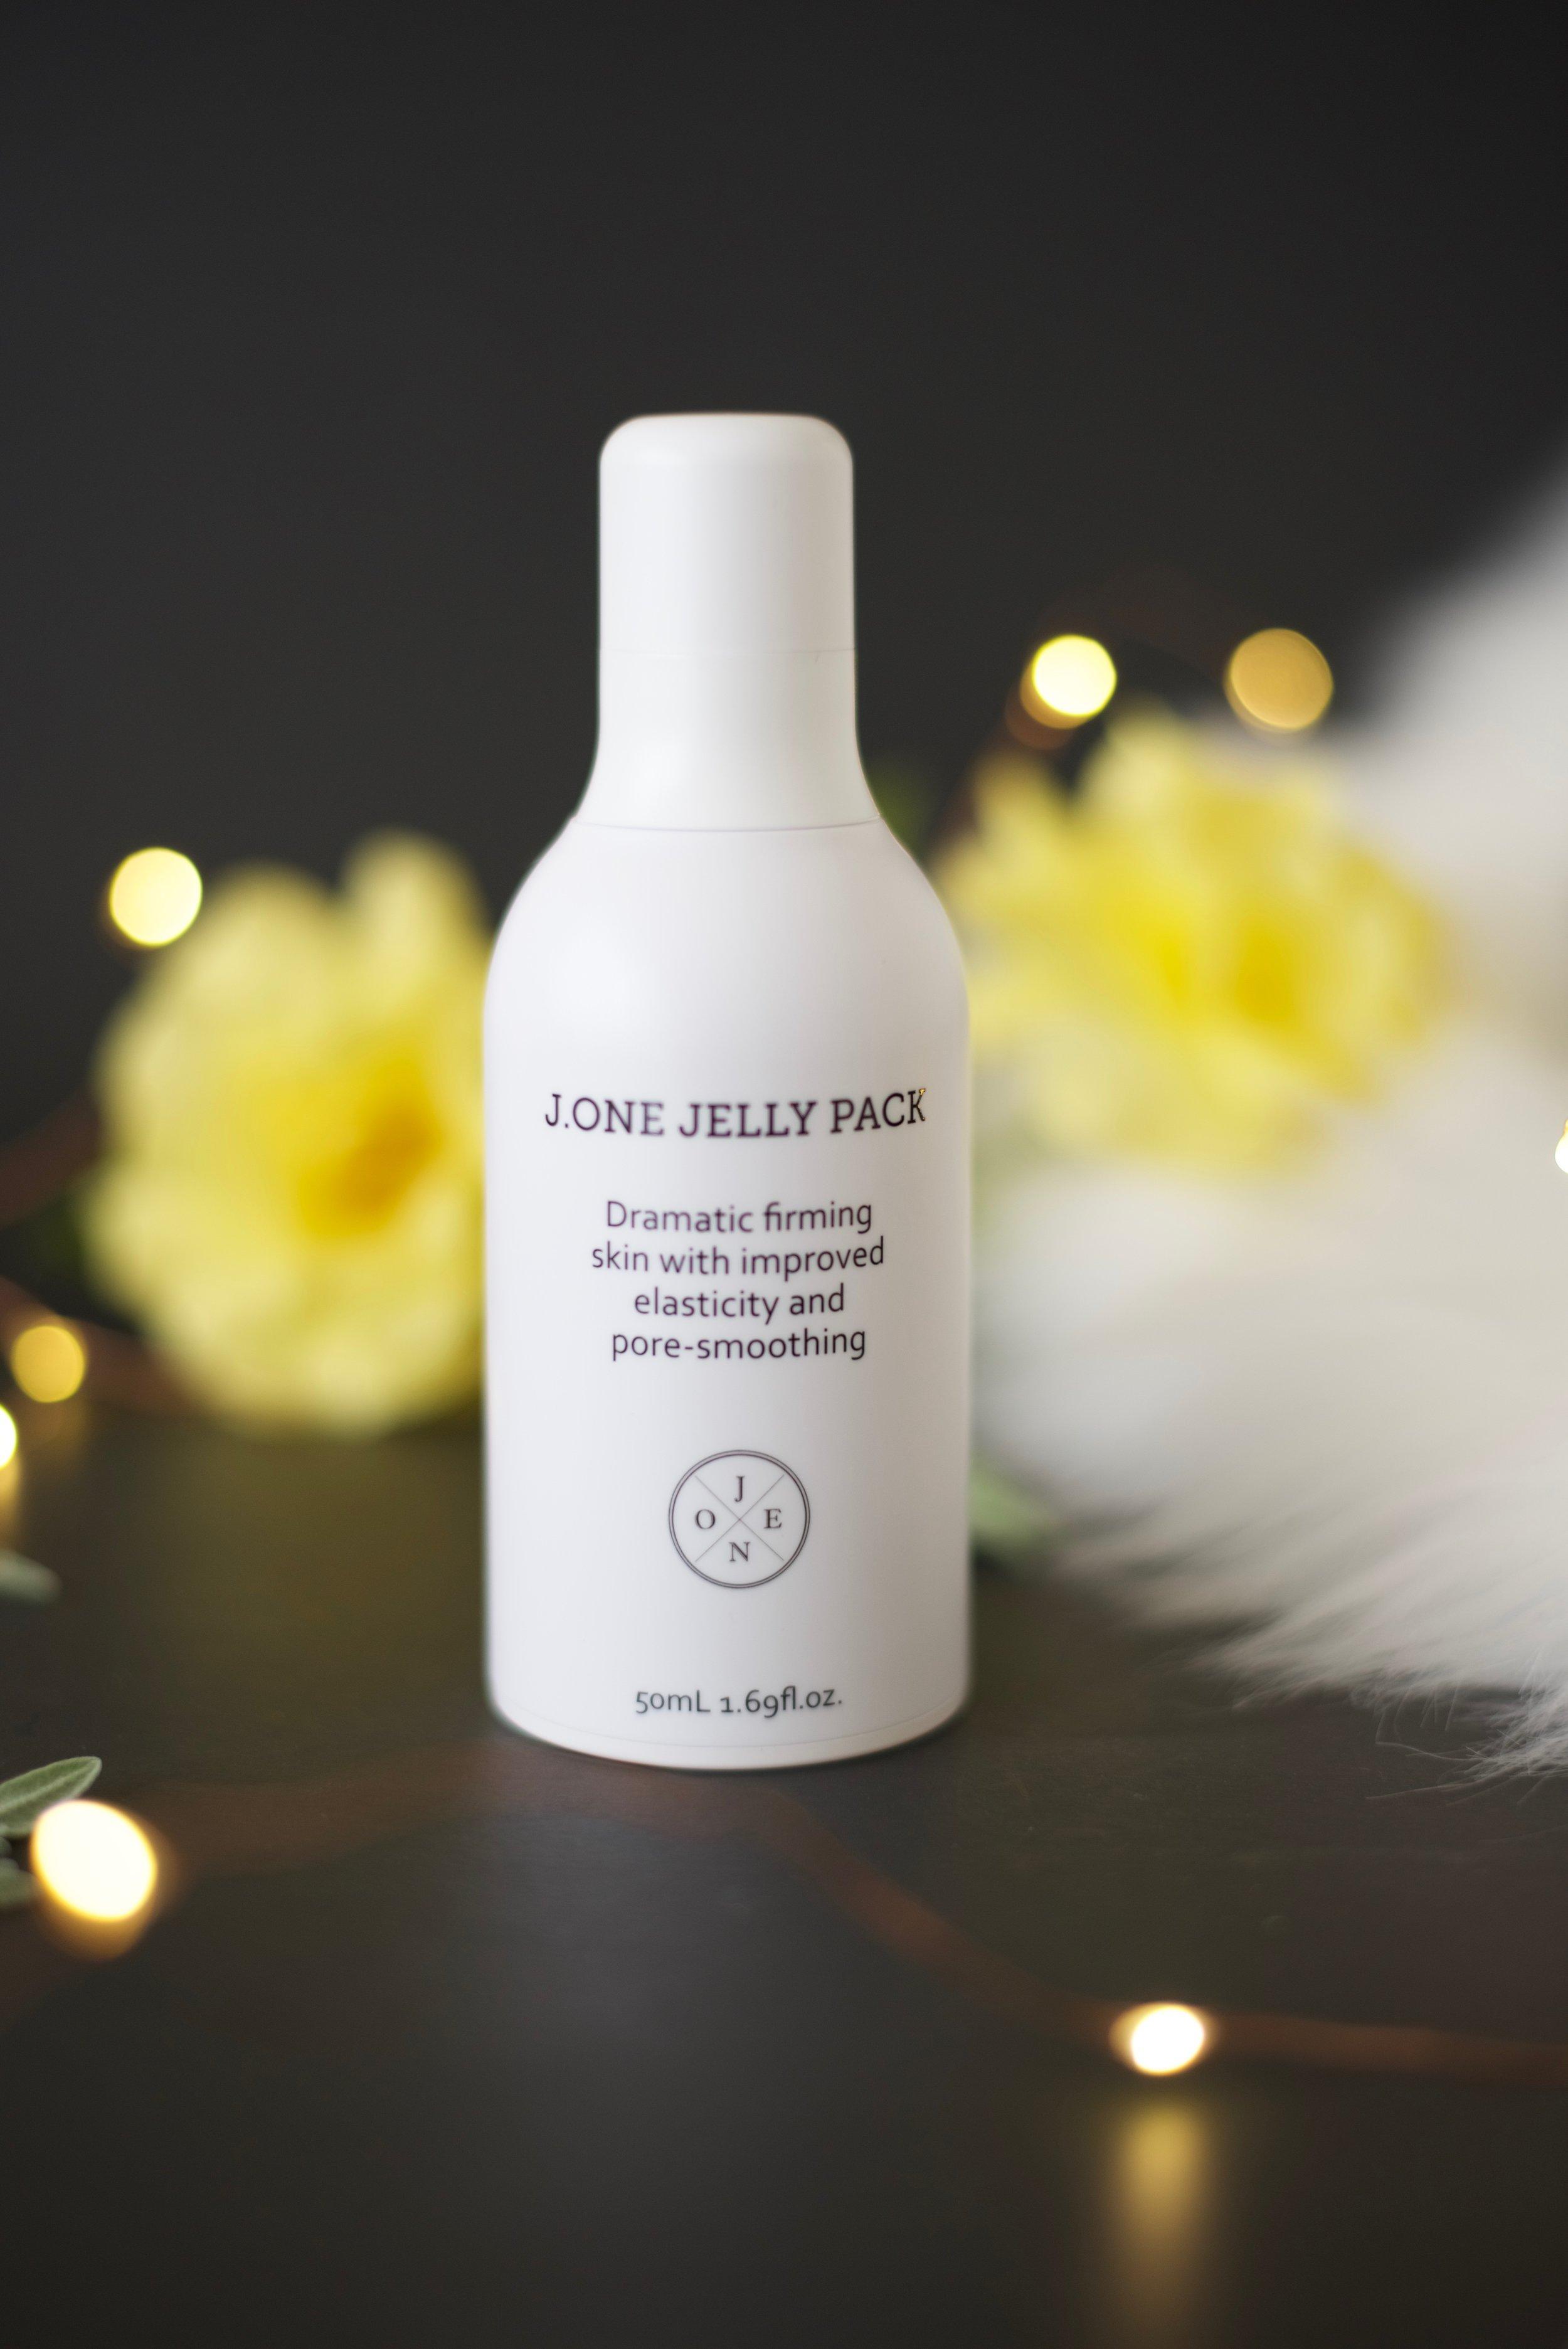 Jone Jelly Pack Review_DSC_6584.jpg